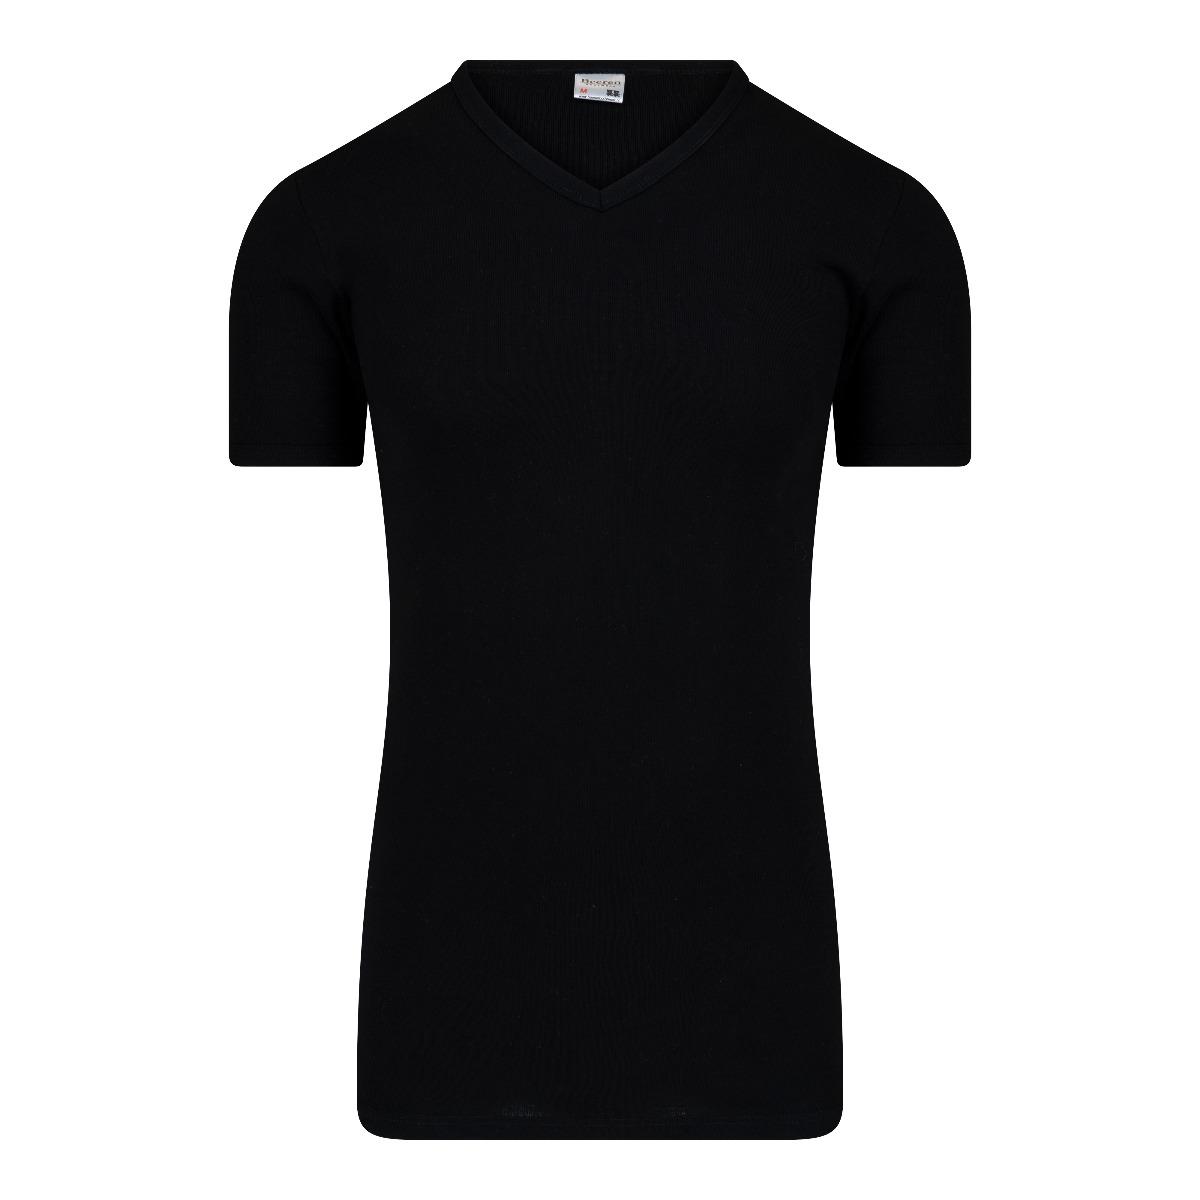 Beeren M3000 Heren T-shirt V-hals Extra Lang Zwart Xxl